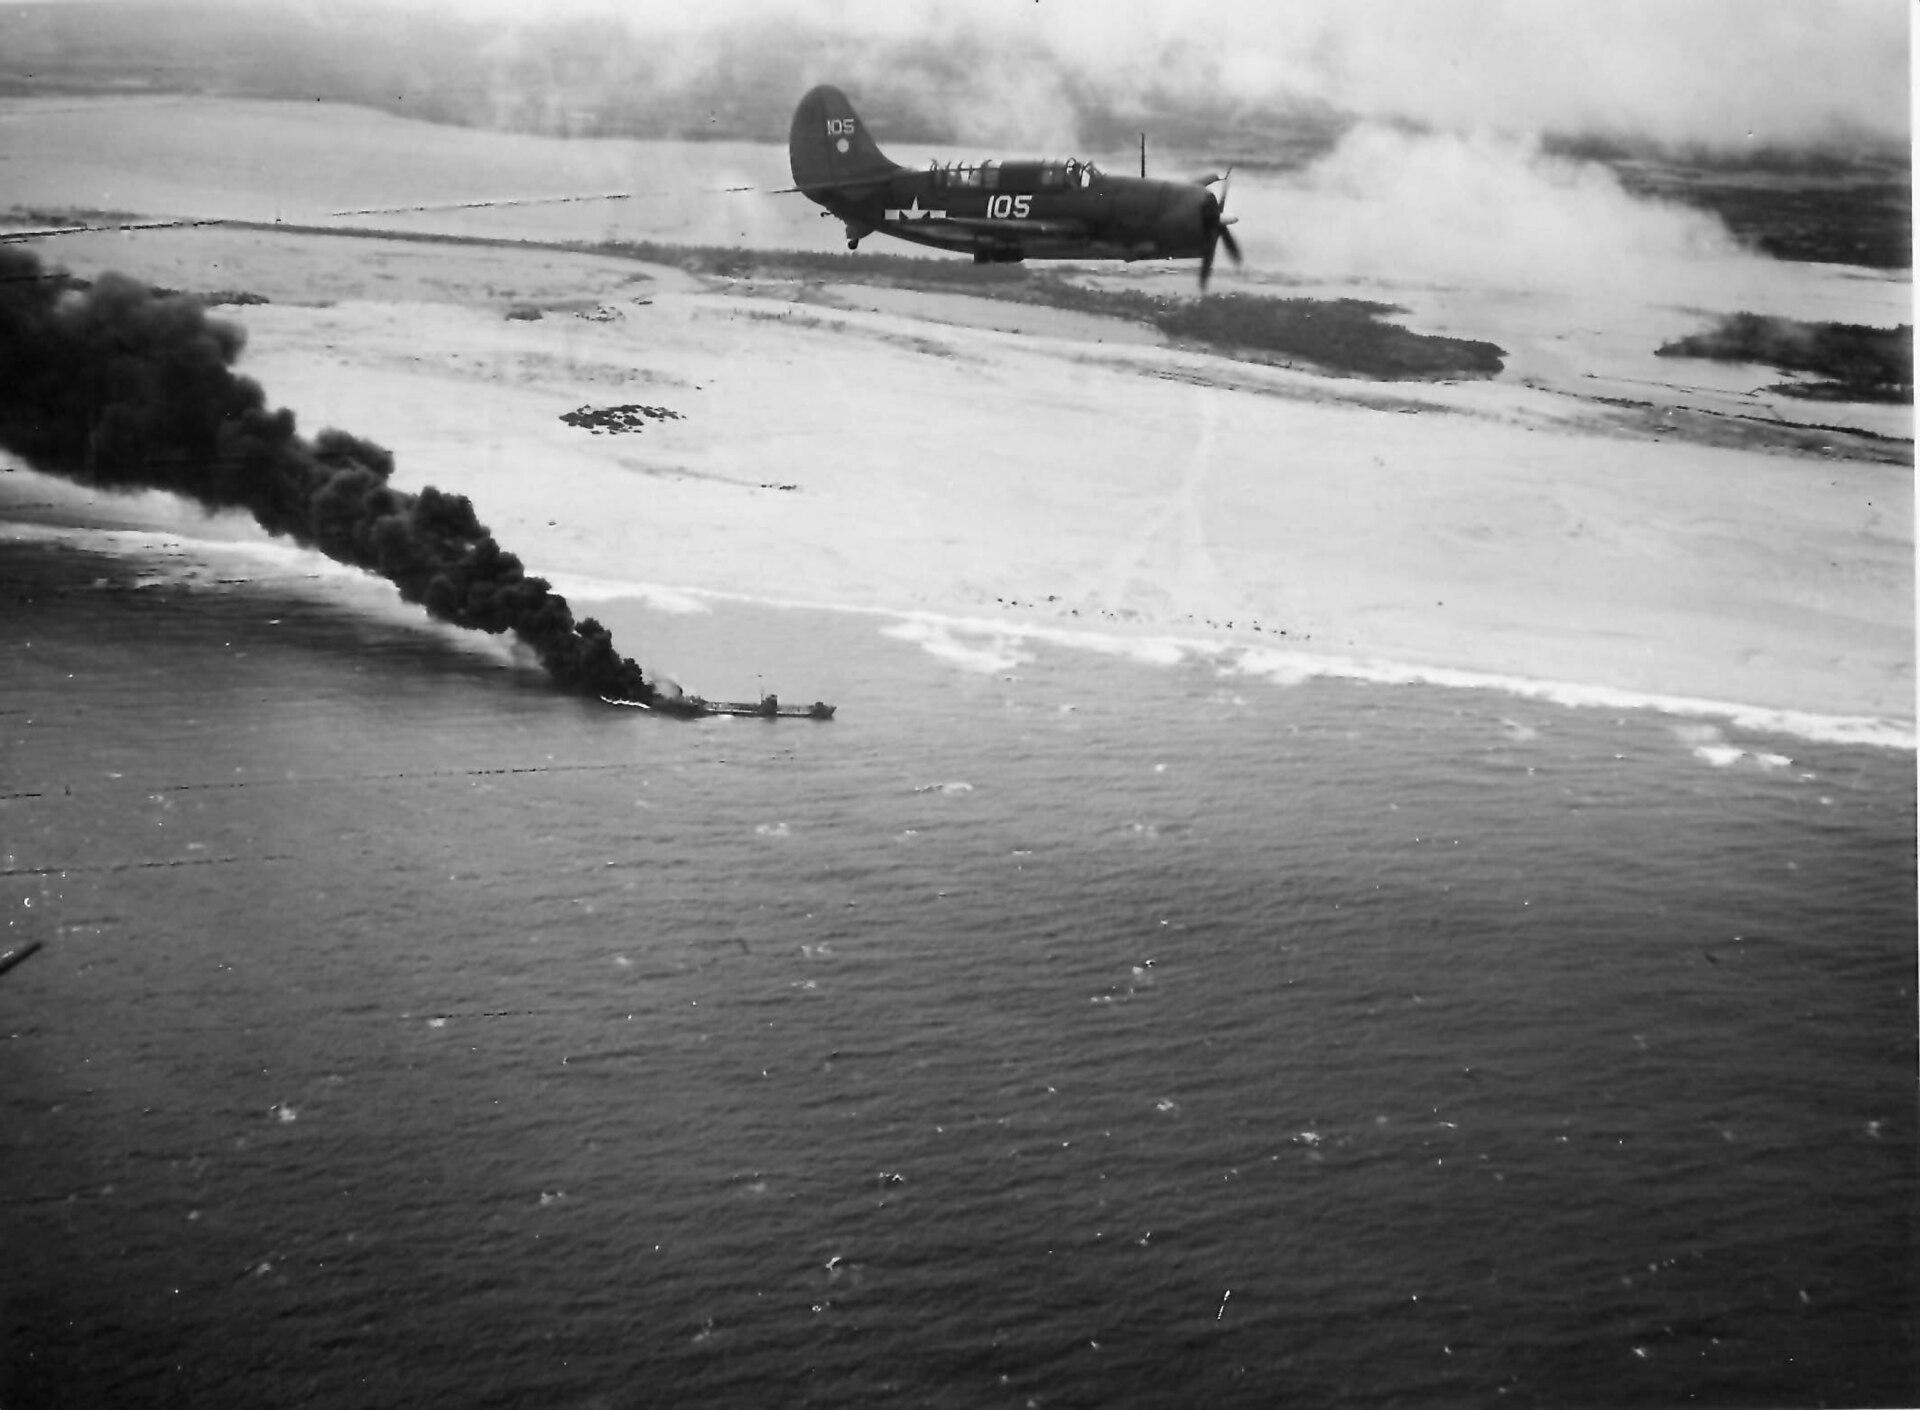 South China Sea raid - Wikipedia